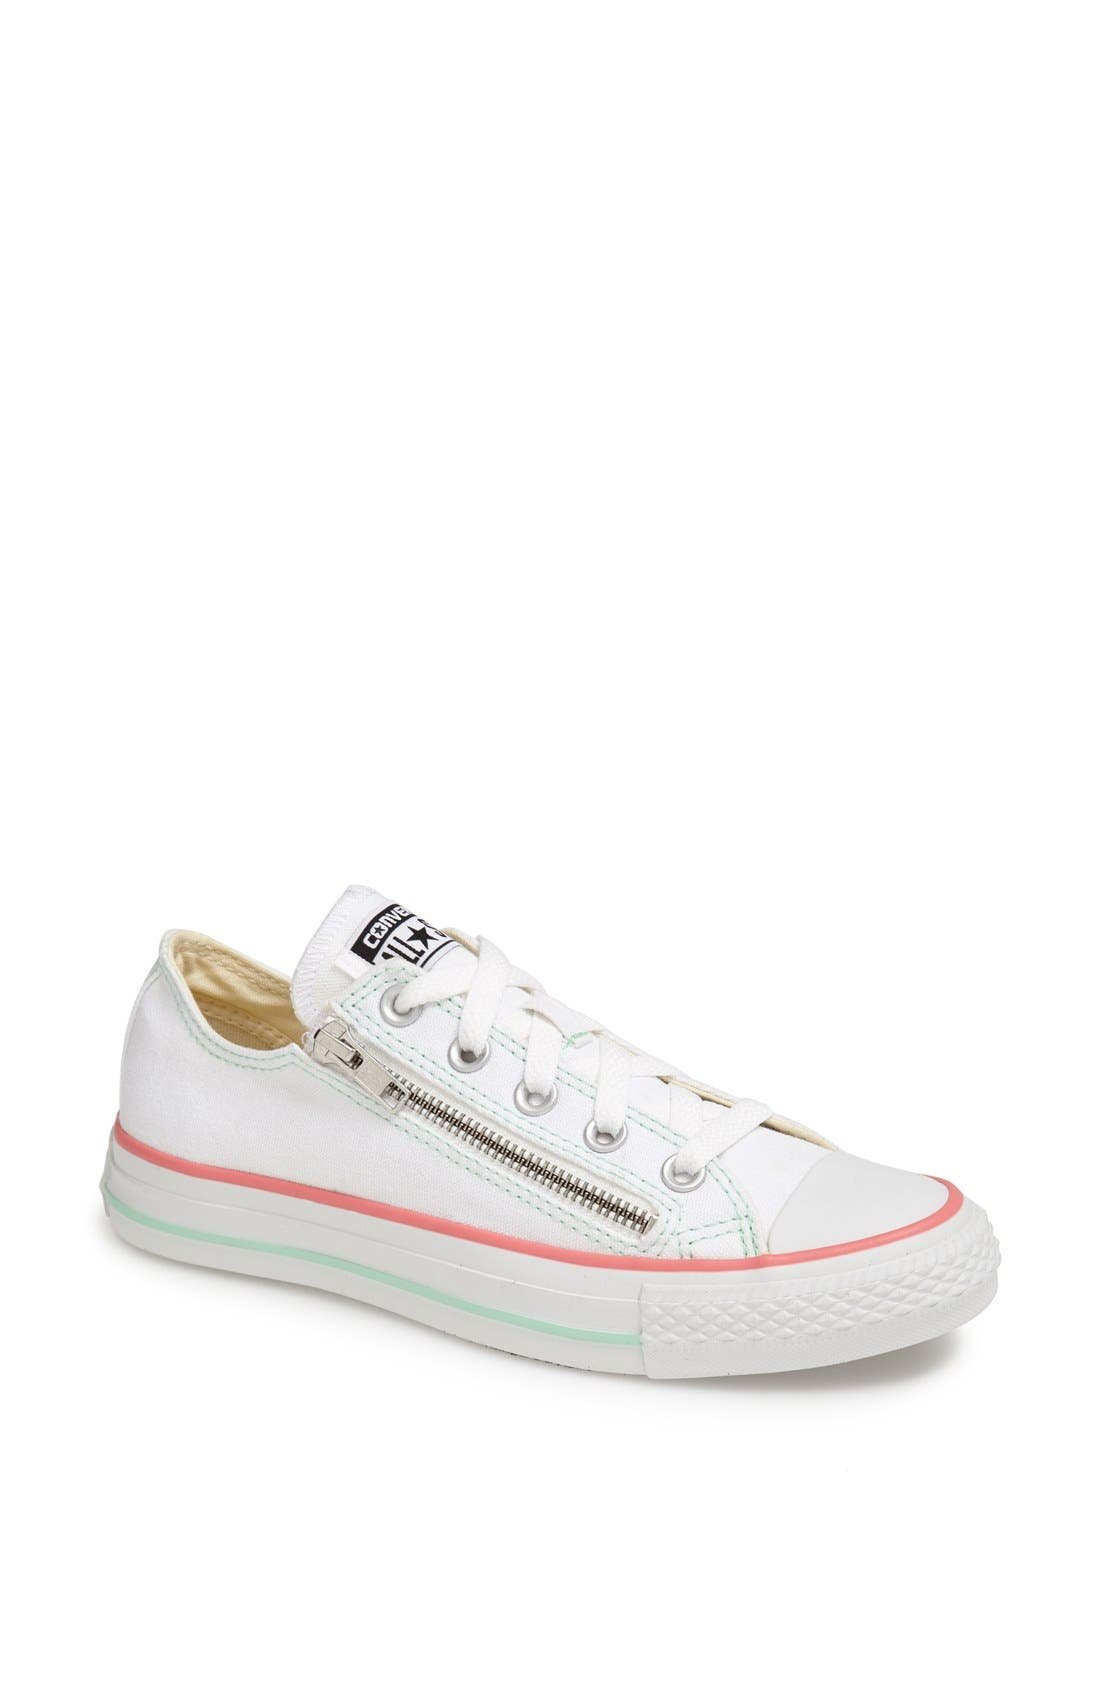 Main Image - Converse Chuck Taylor® All Star® Double Zip Low Sneaker (Women)